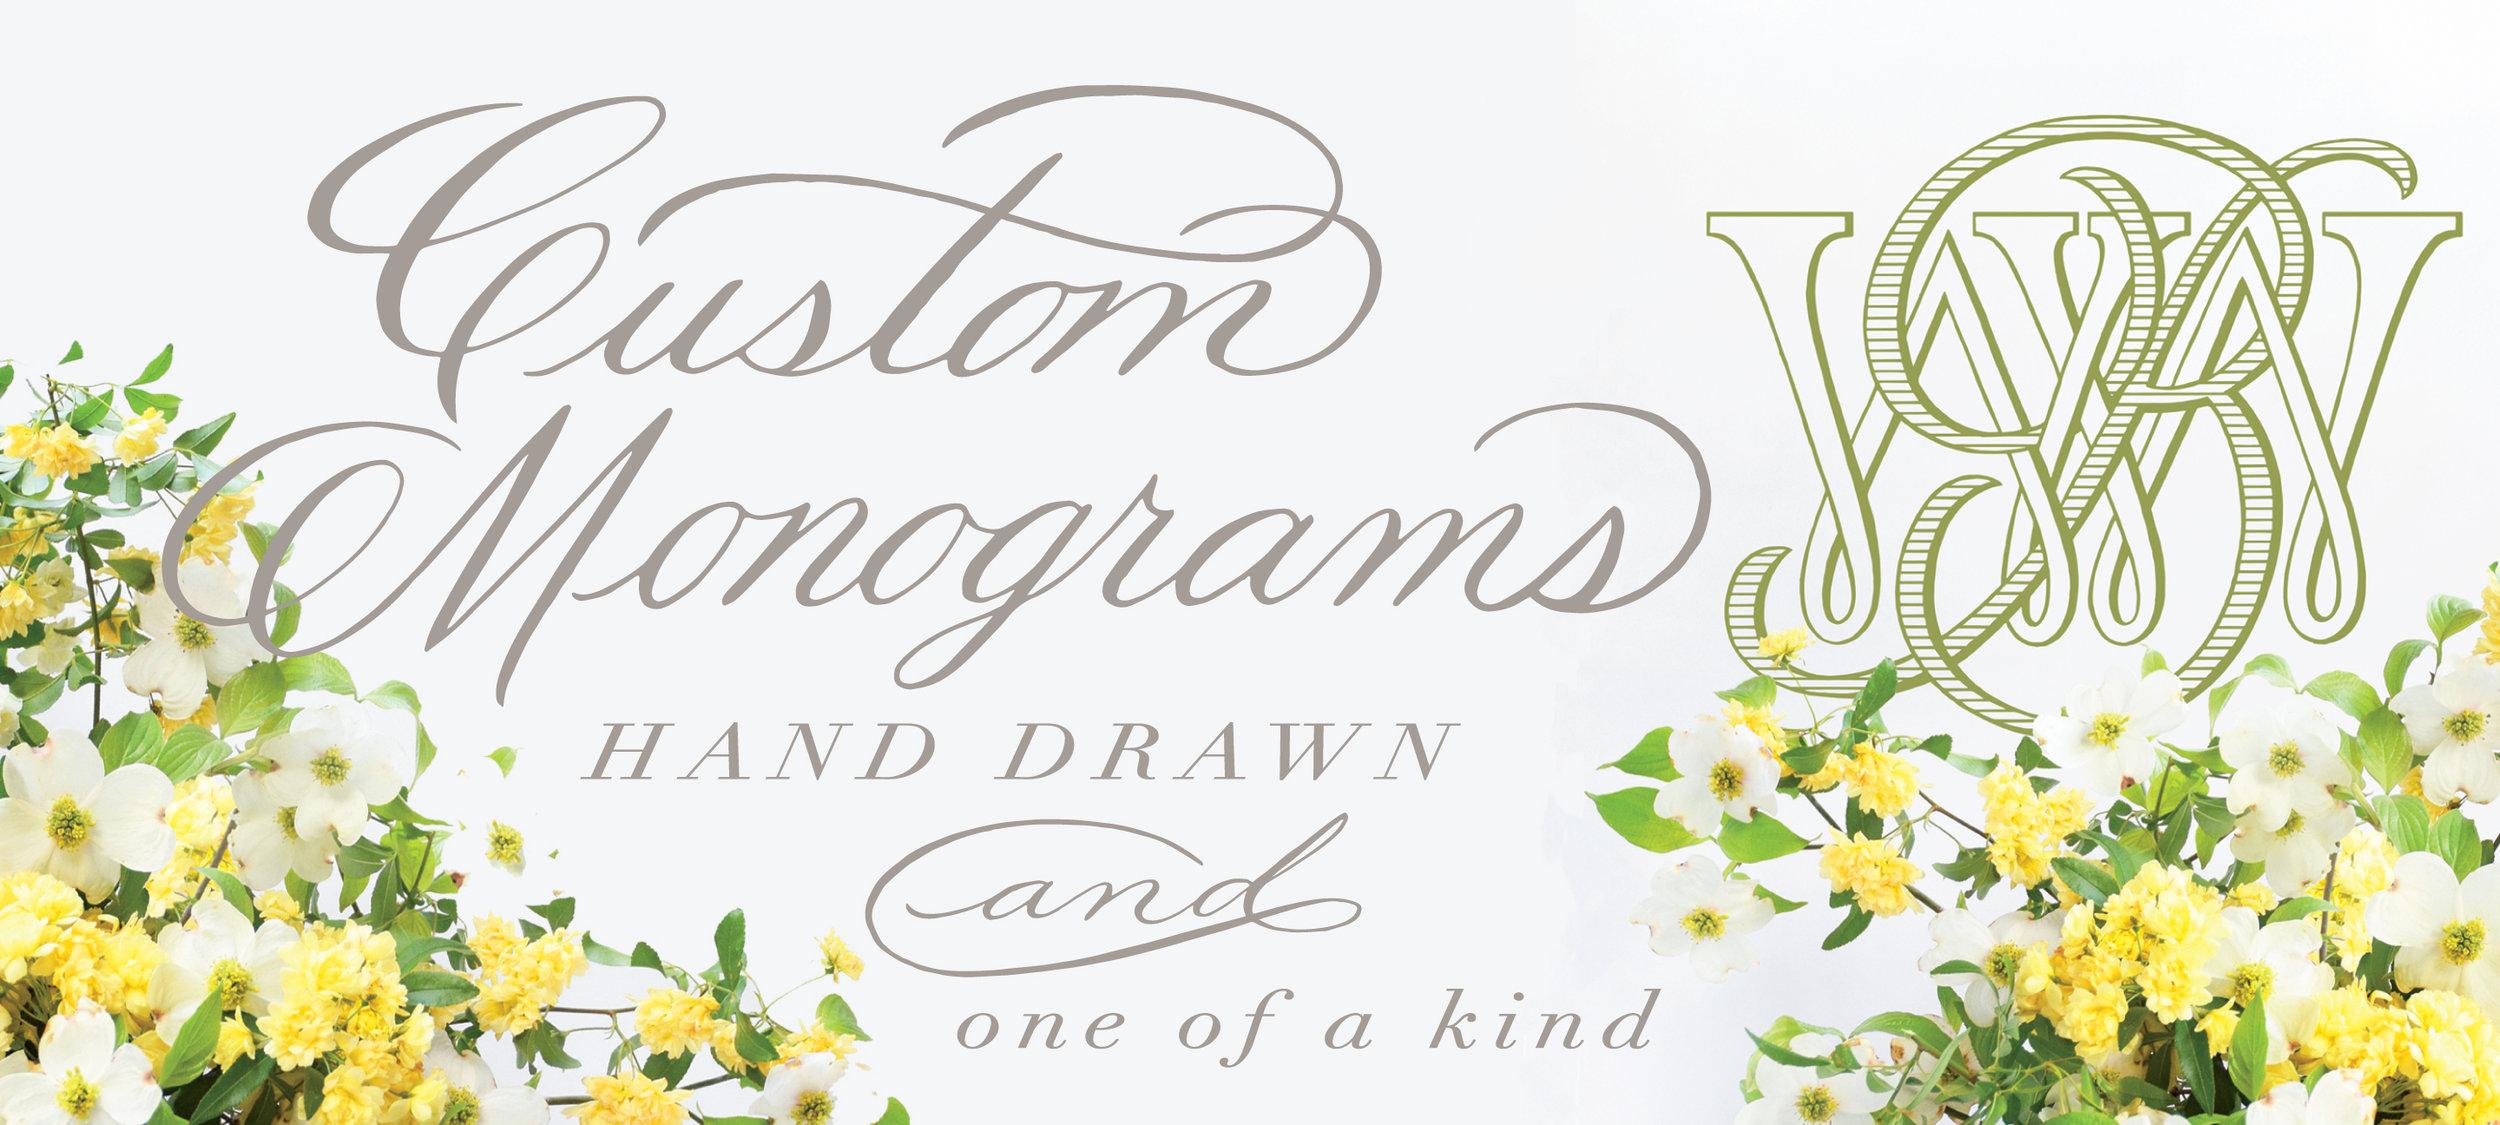 Custom-Monogram-Spring-Lead---April-2019.jpg